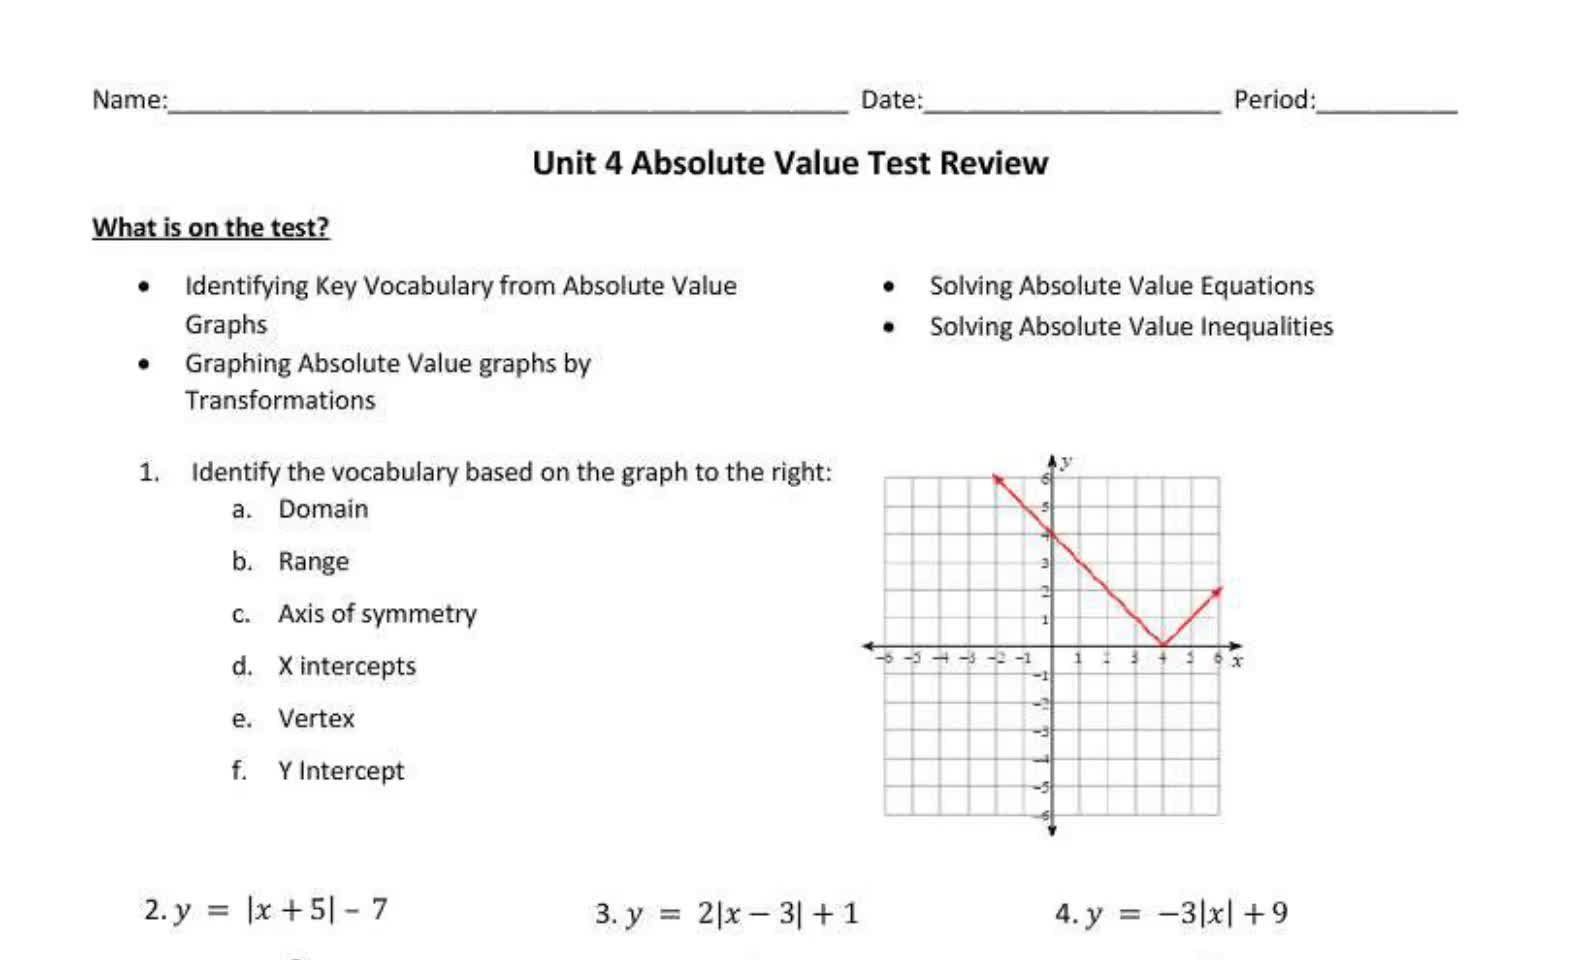 Senior Unit 4 Absolute Value Test Review